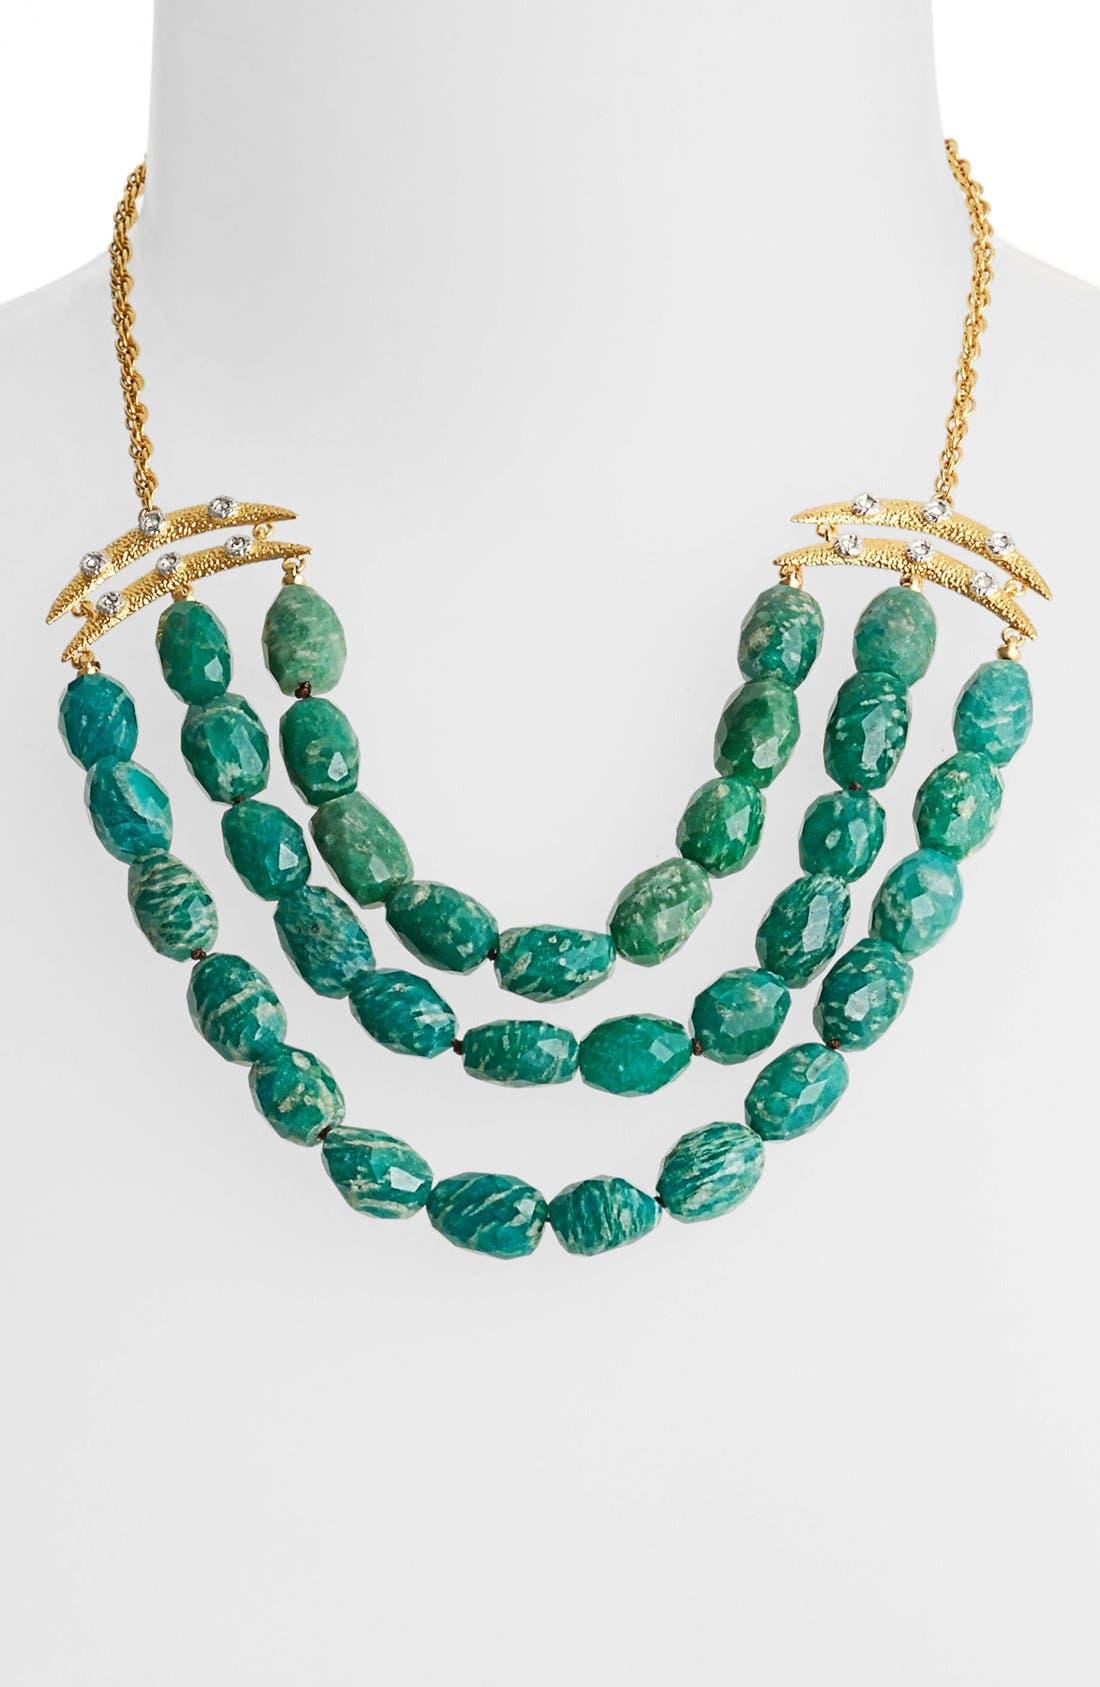 Main Image - Alexis Bittar 'Elements' Beaded Bib Necklace